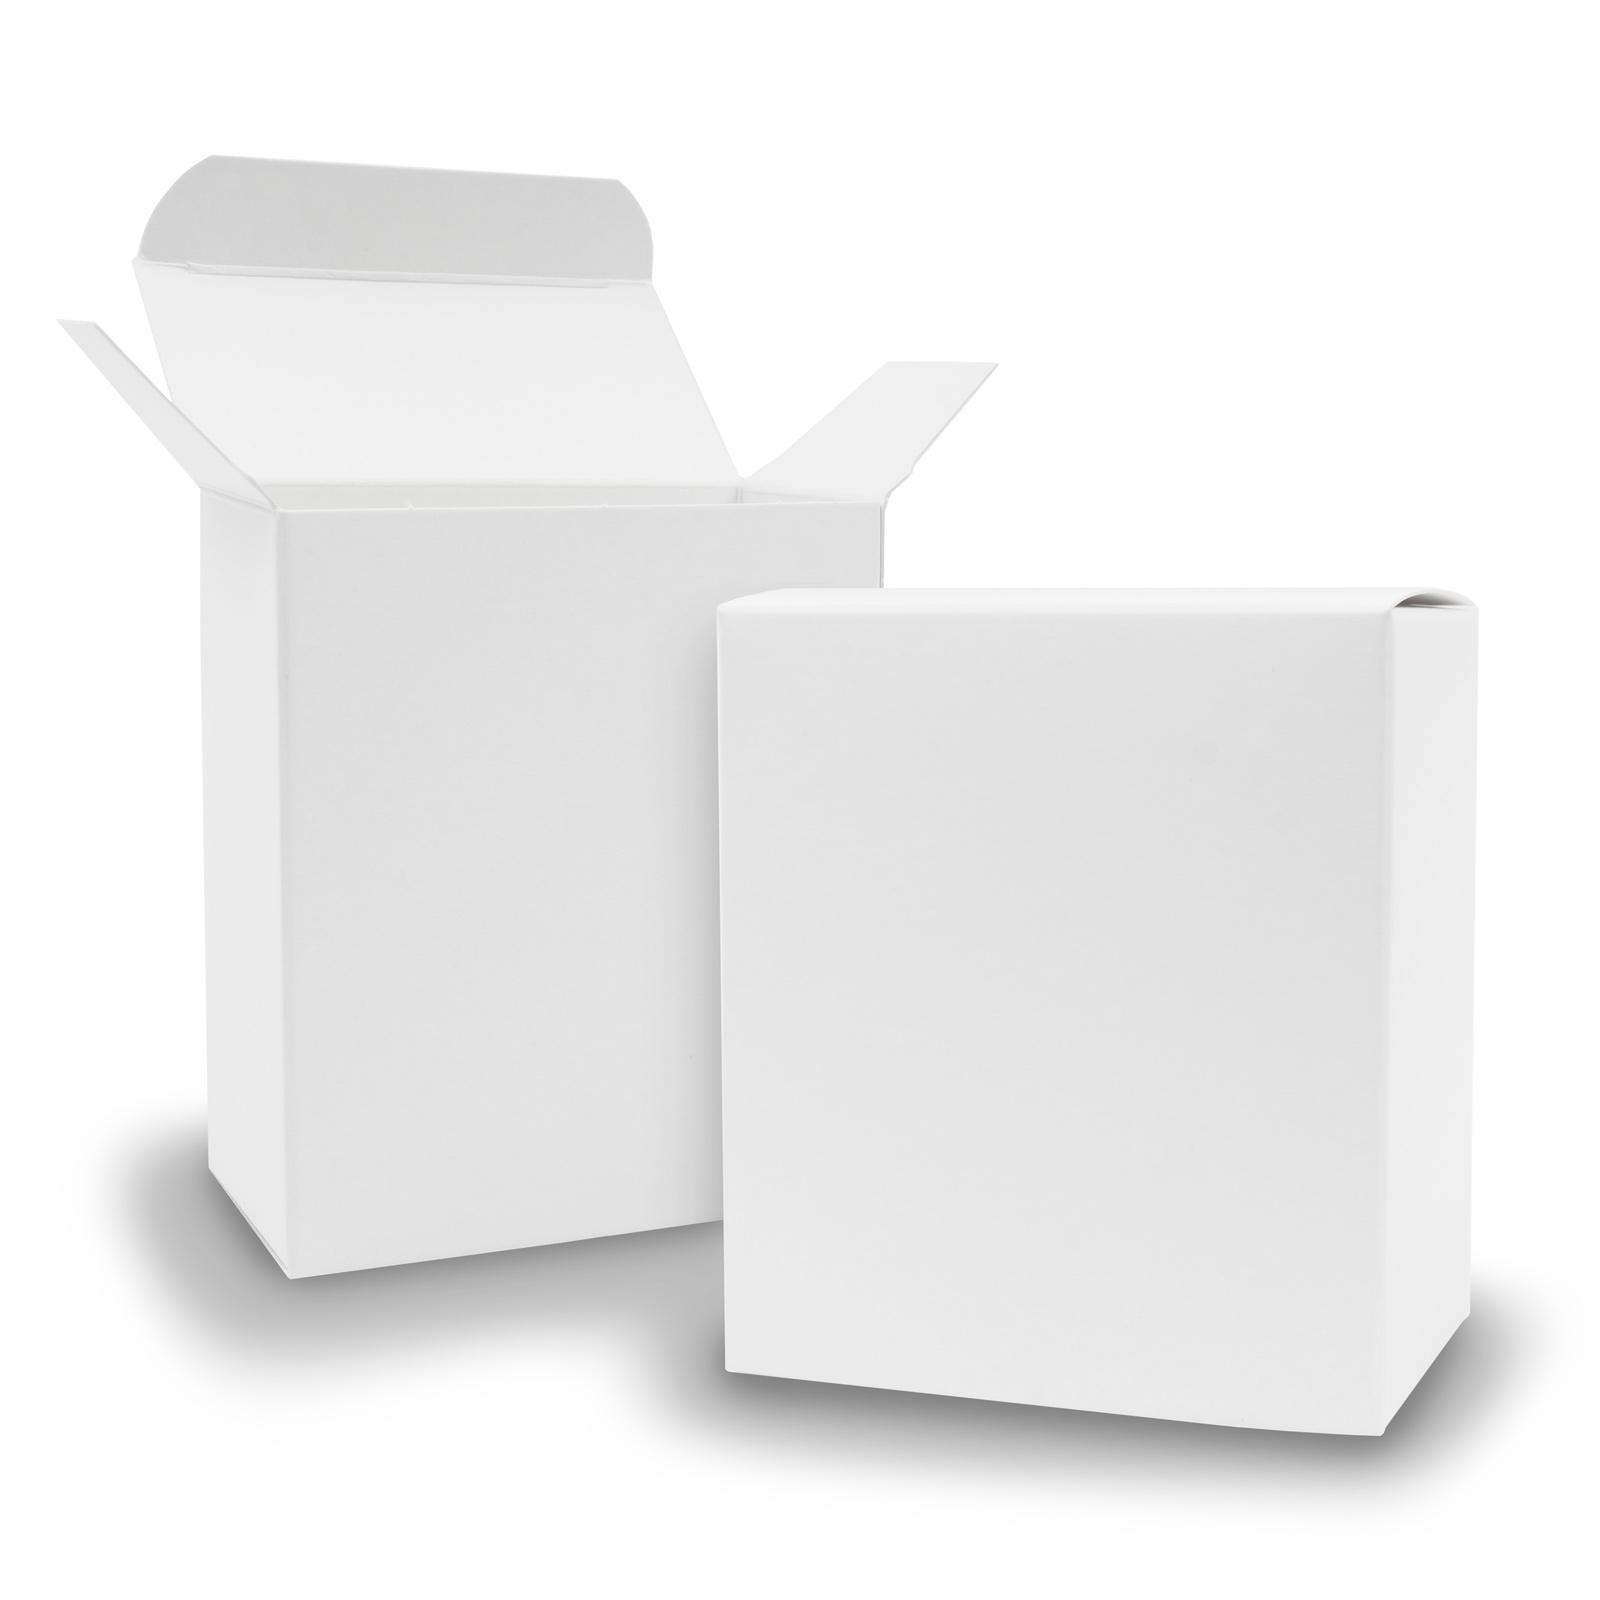 25x itenga Quader Faltschachtel aus Karton 8x4x9cm weiß ...